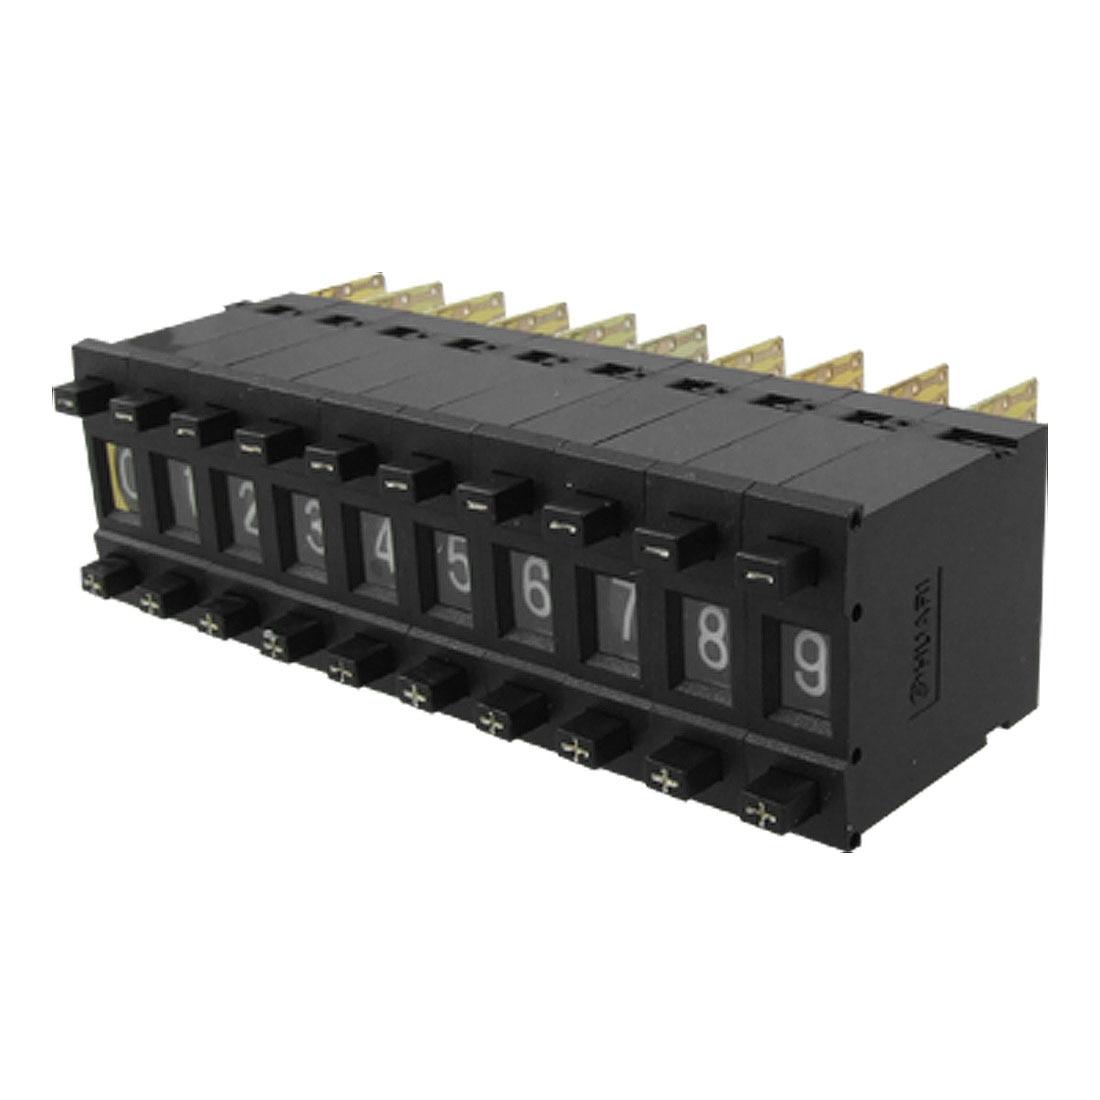 3 Pcs 0 9 Digit One Unit Binary Coded Decimal Thumbwheel Switch In Switches Plastic Knob And Bezel Speed Rotary Heater Fan Uxcell 10 Km1 Digital Single Pushwheel